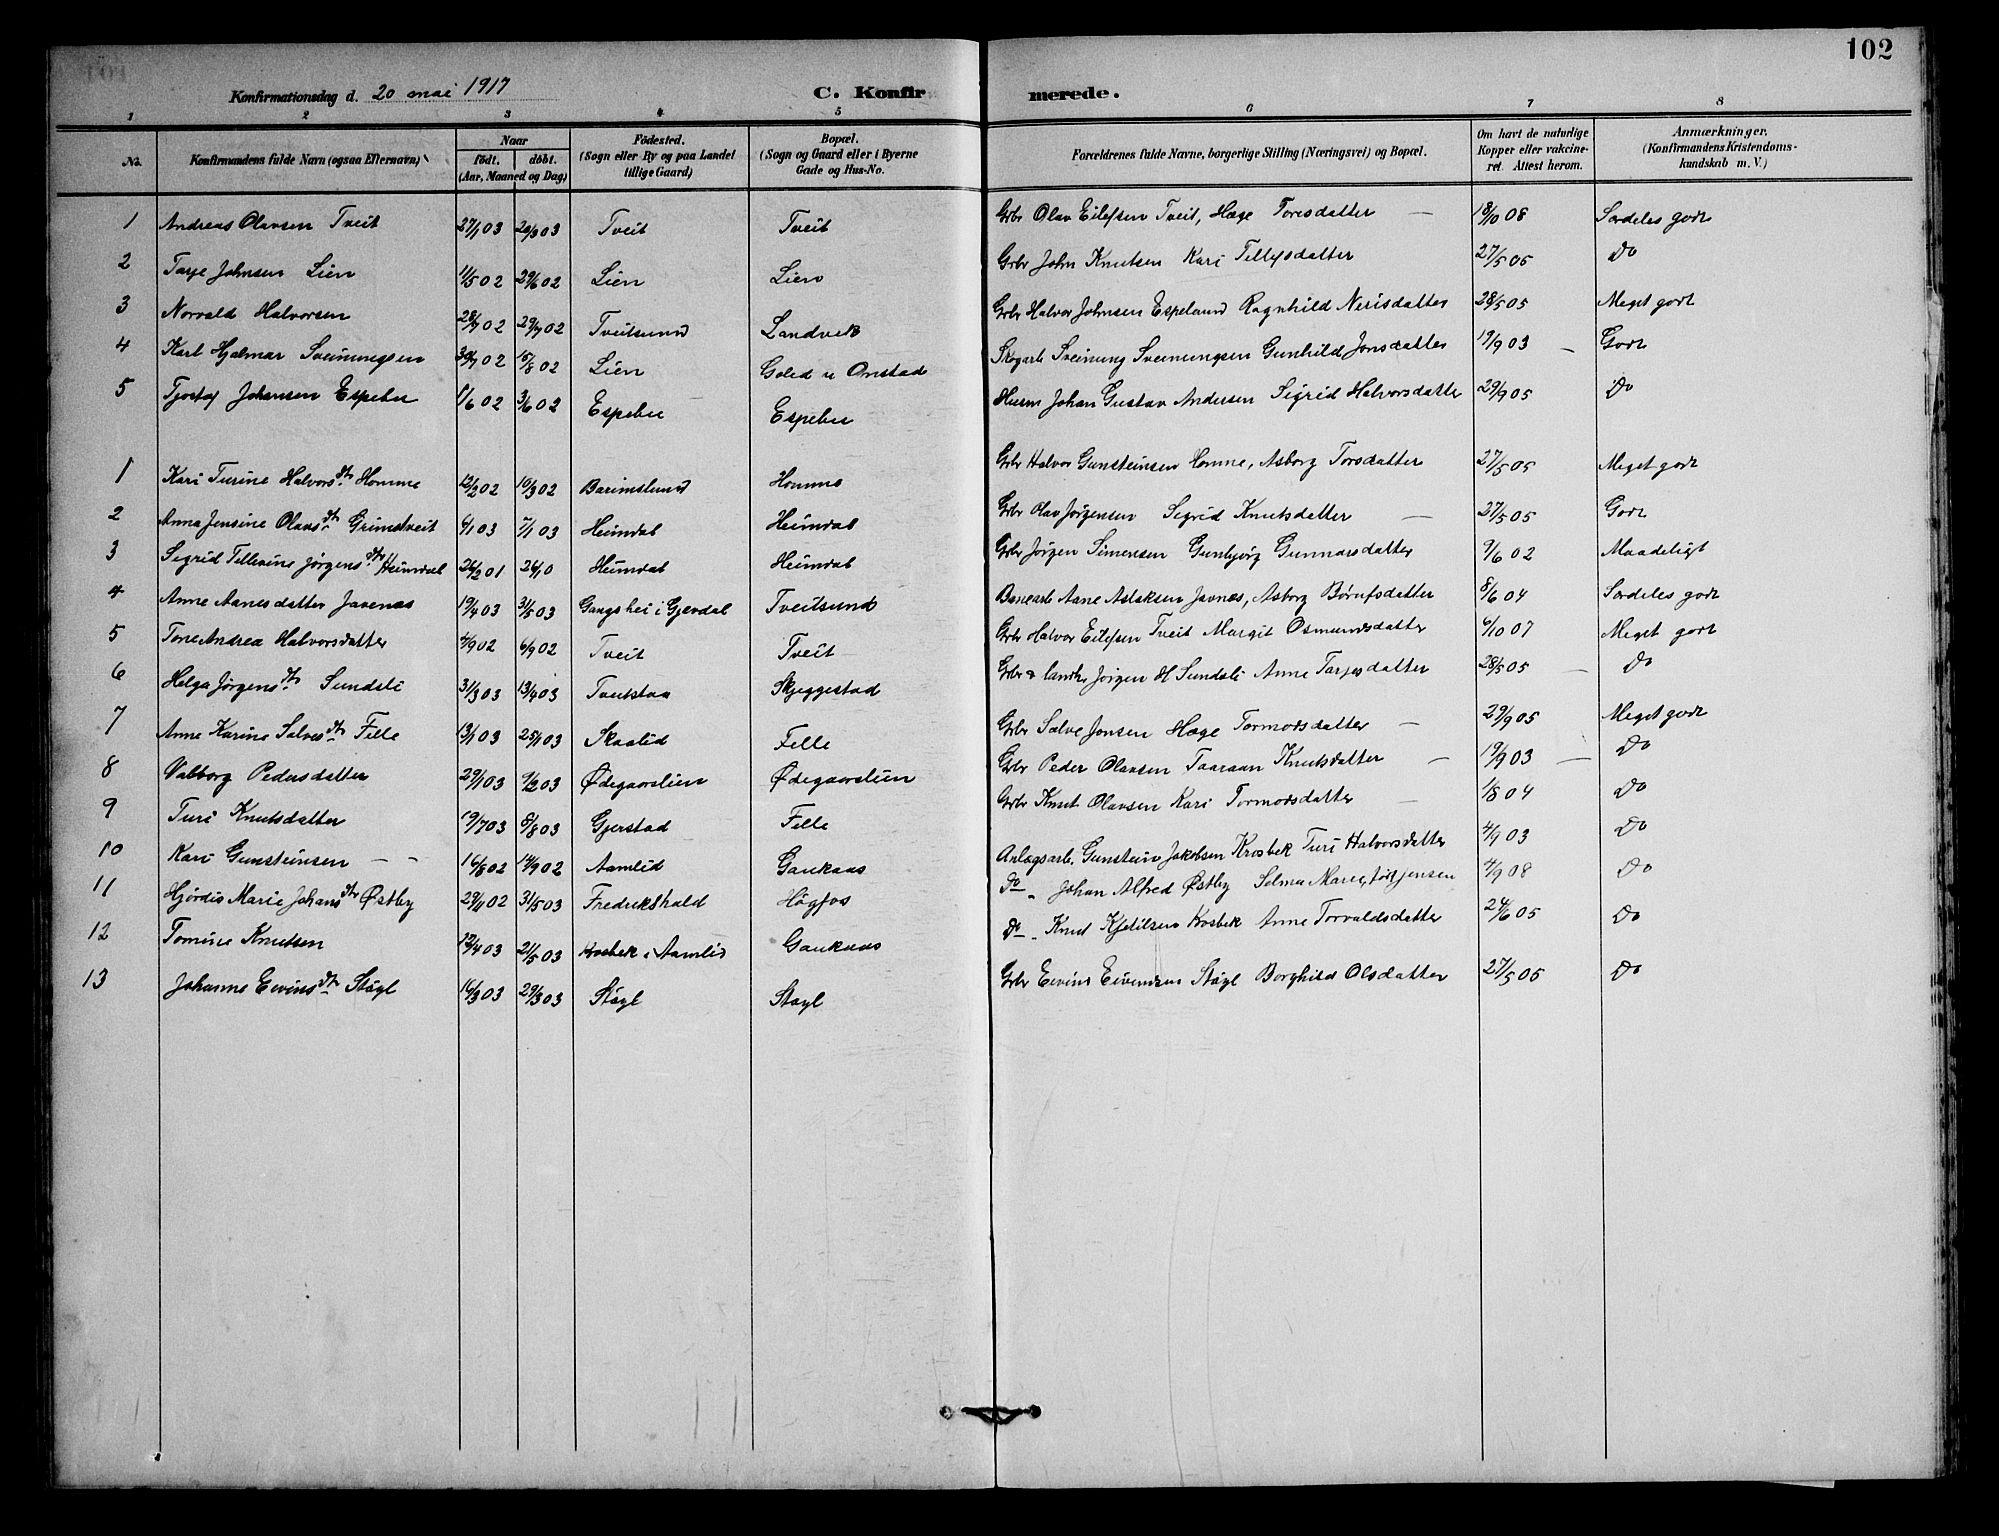 SAKO, Nissedal kirkebøker, G/Gb/L0003: Klokkerbok nr. II 3, 1893-1928, s. 102